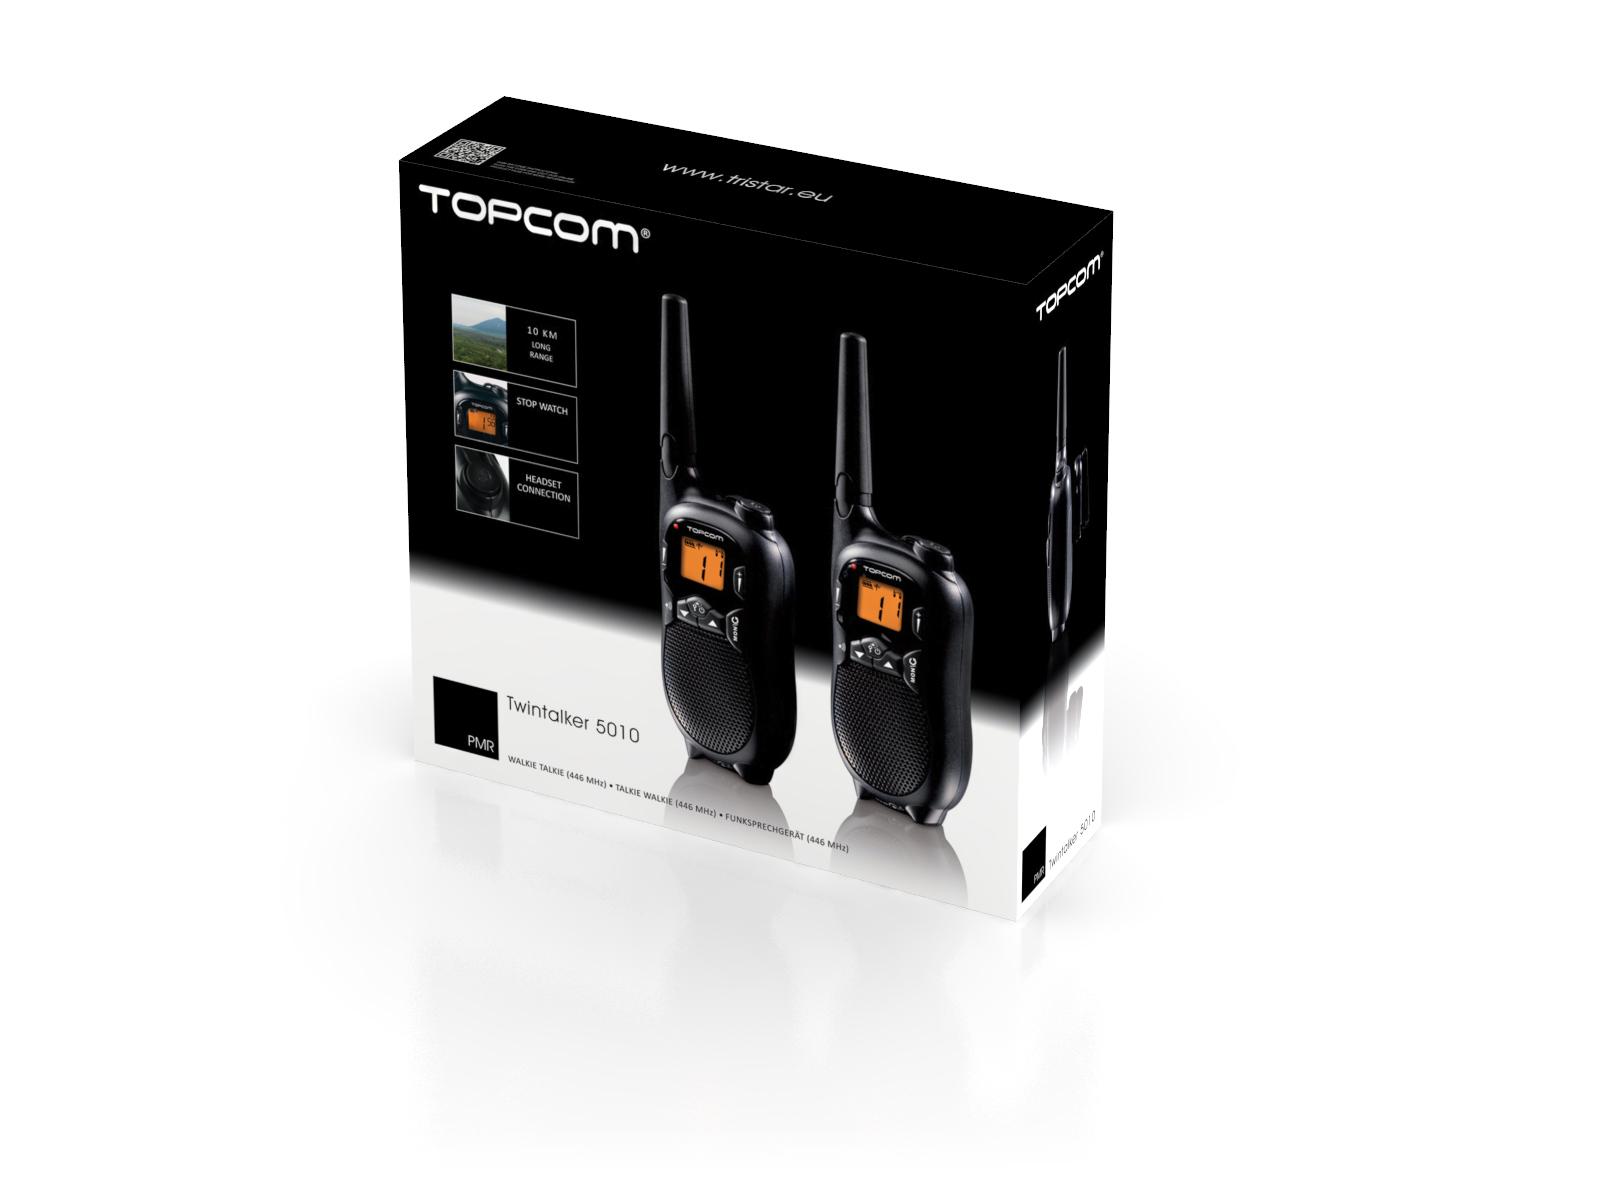 Topcom Twintalker 5010 8canali 446MHz Nero ricetrasmittente